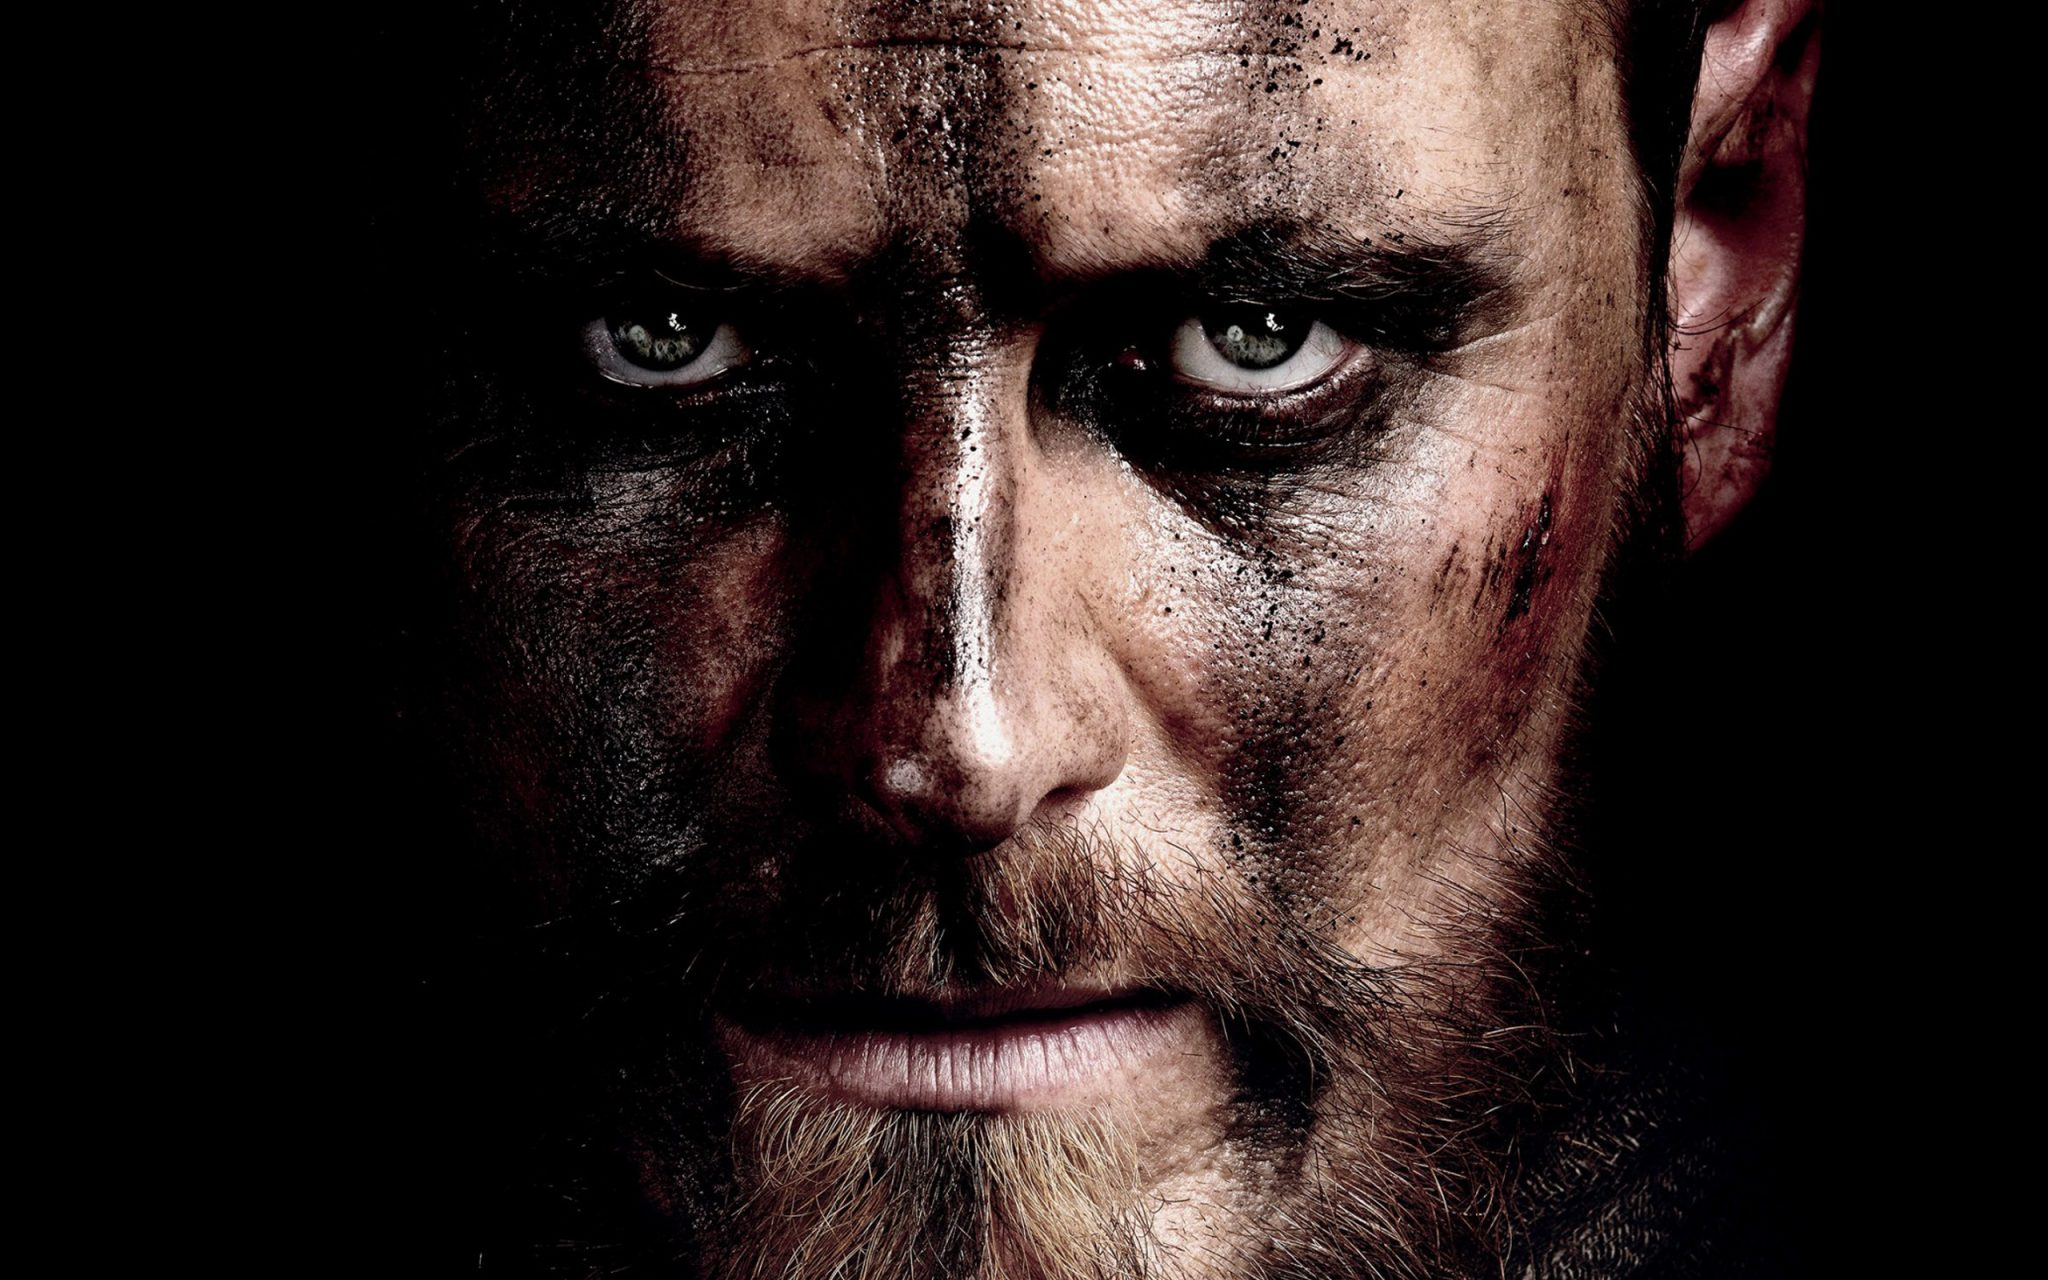 Macbeth_2015_Michael_Fassbender